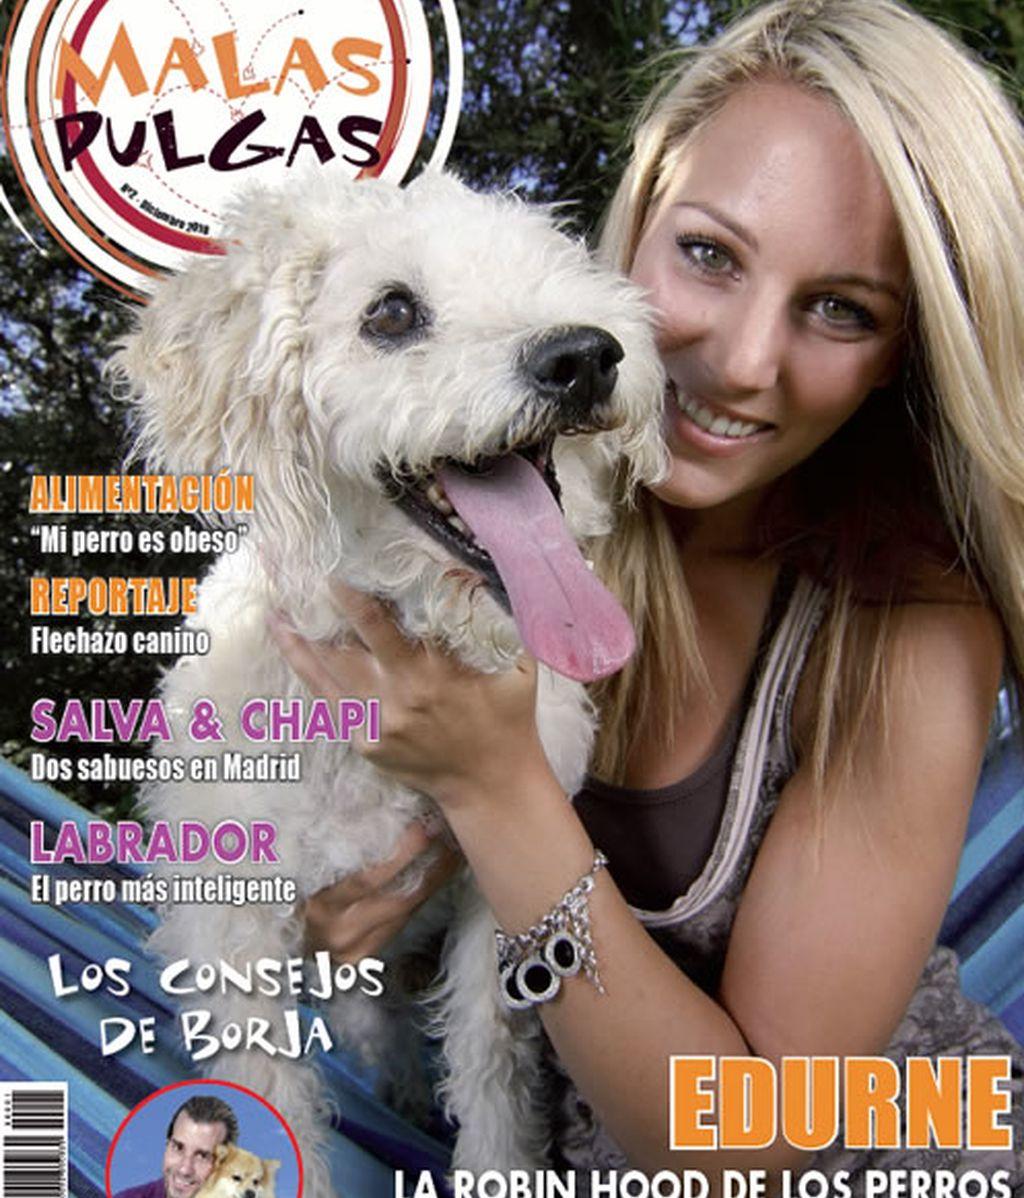 Revista Malas Pulgas. Número 2 (diciembre 2010)